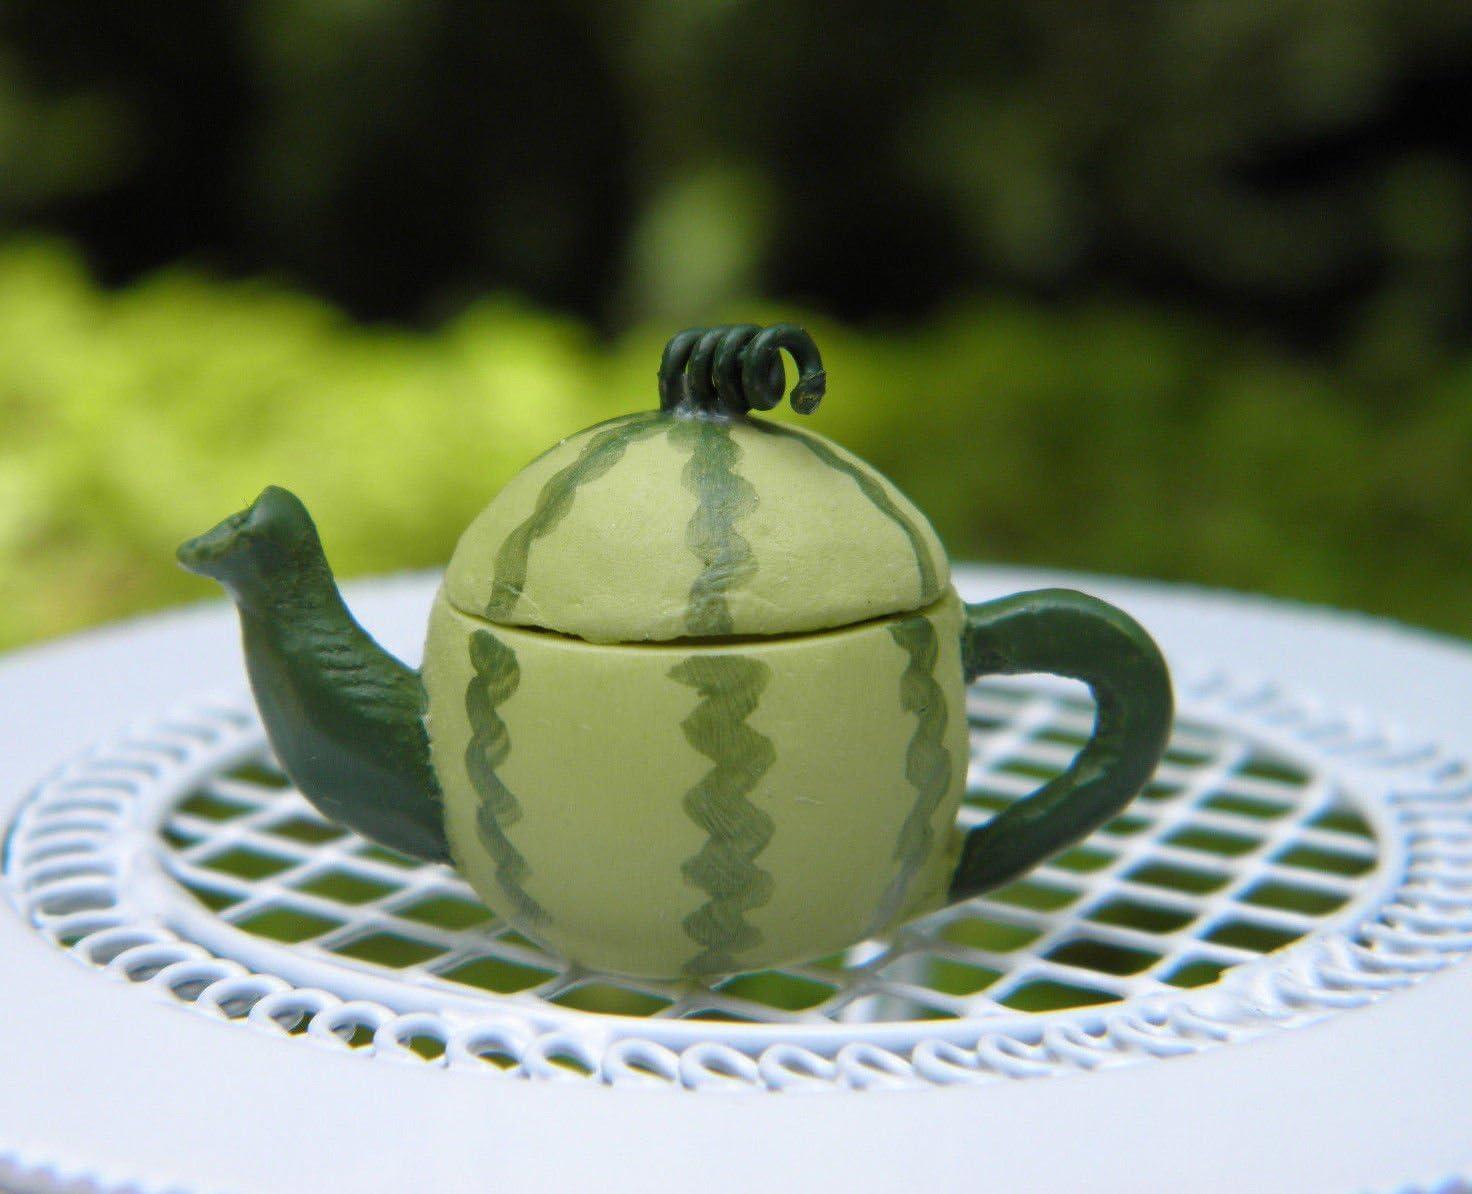 Miniature Dollhouse Fairy Garden Accessories Watermelon Teapot